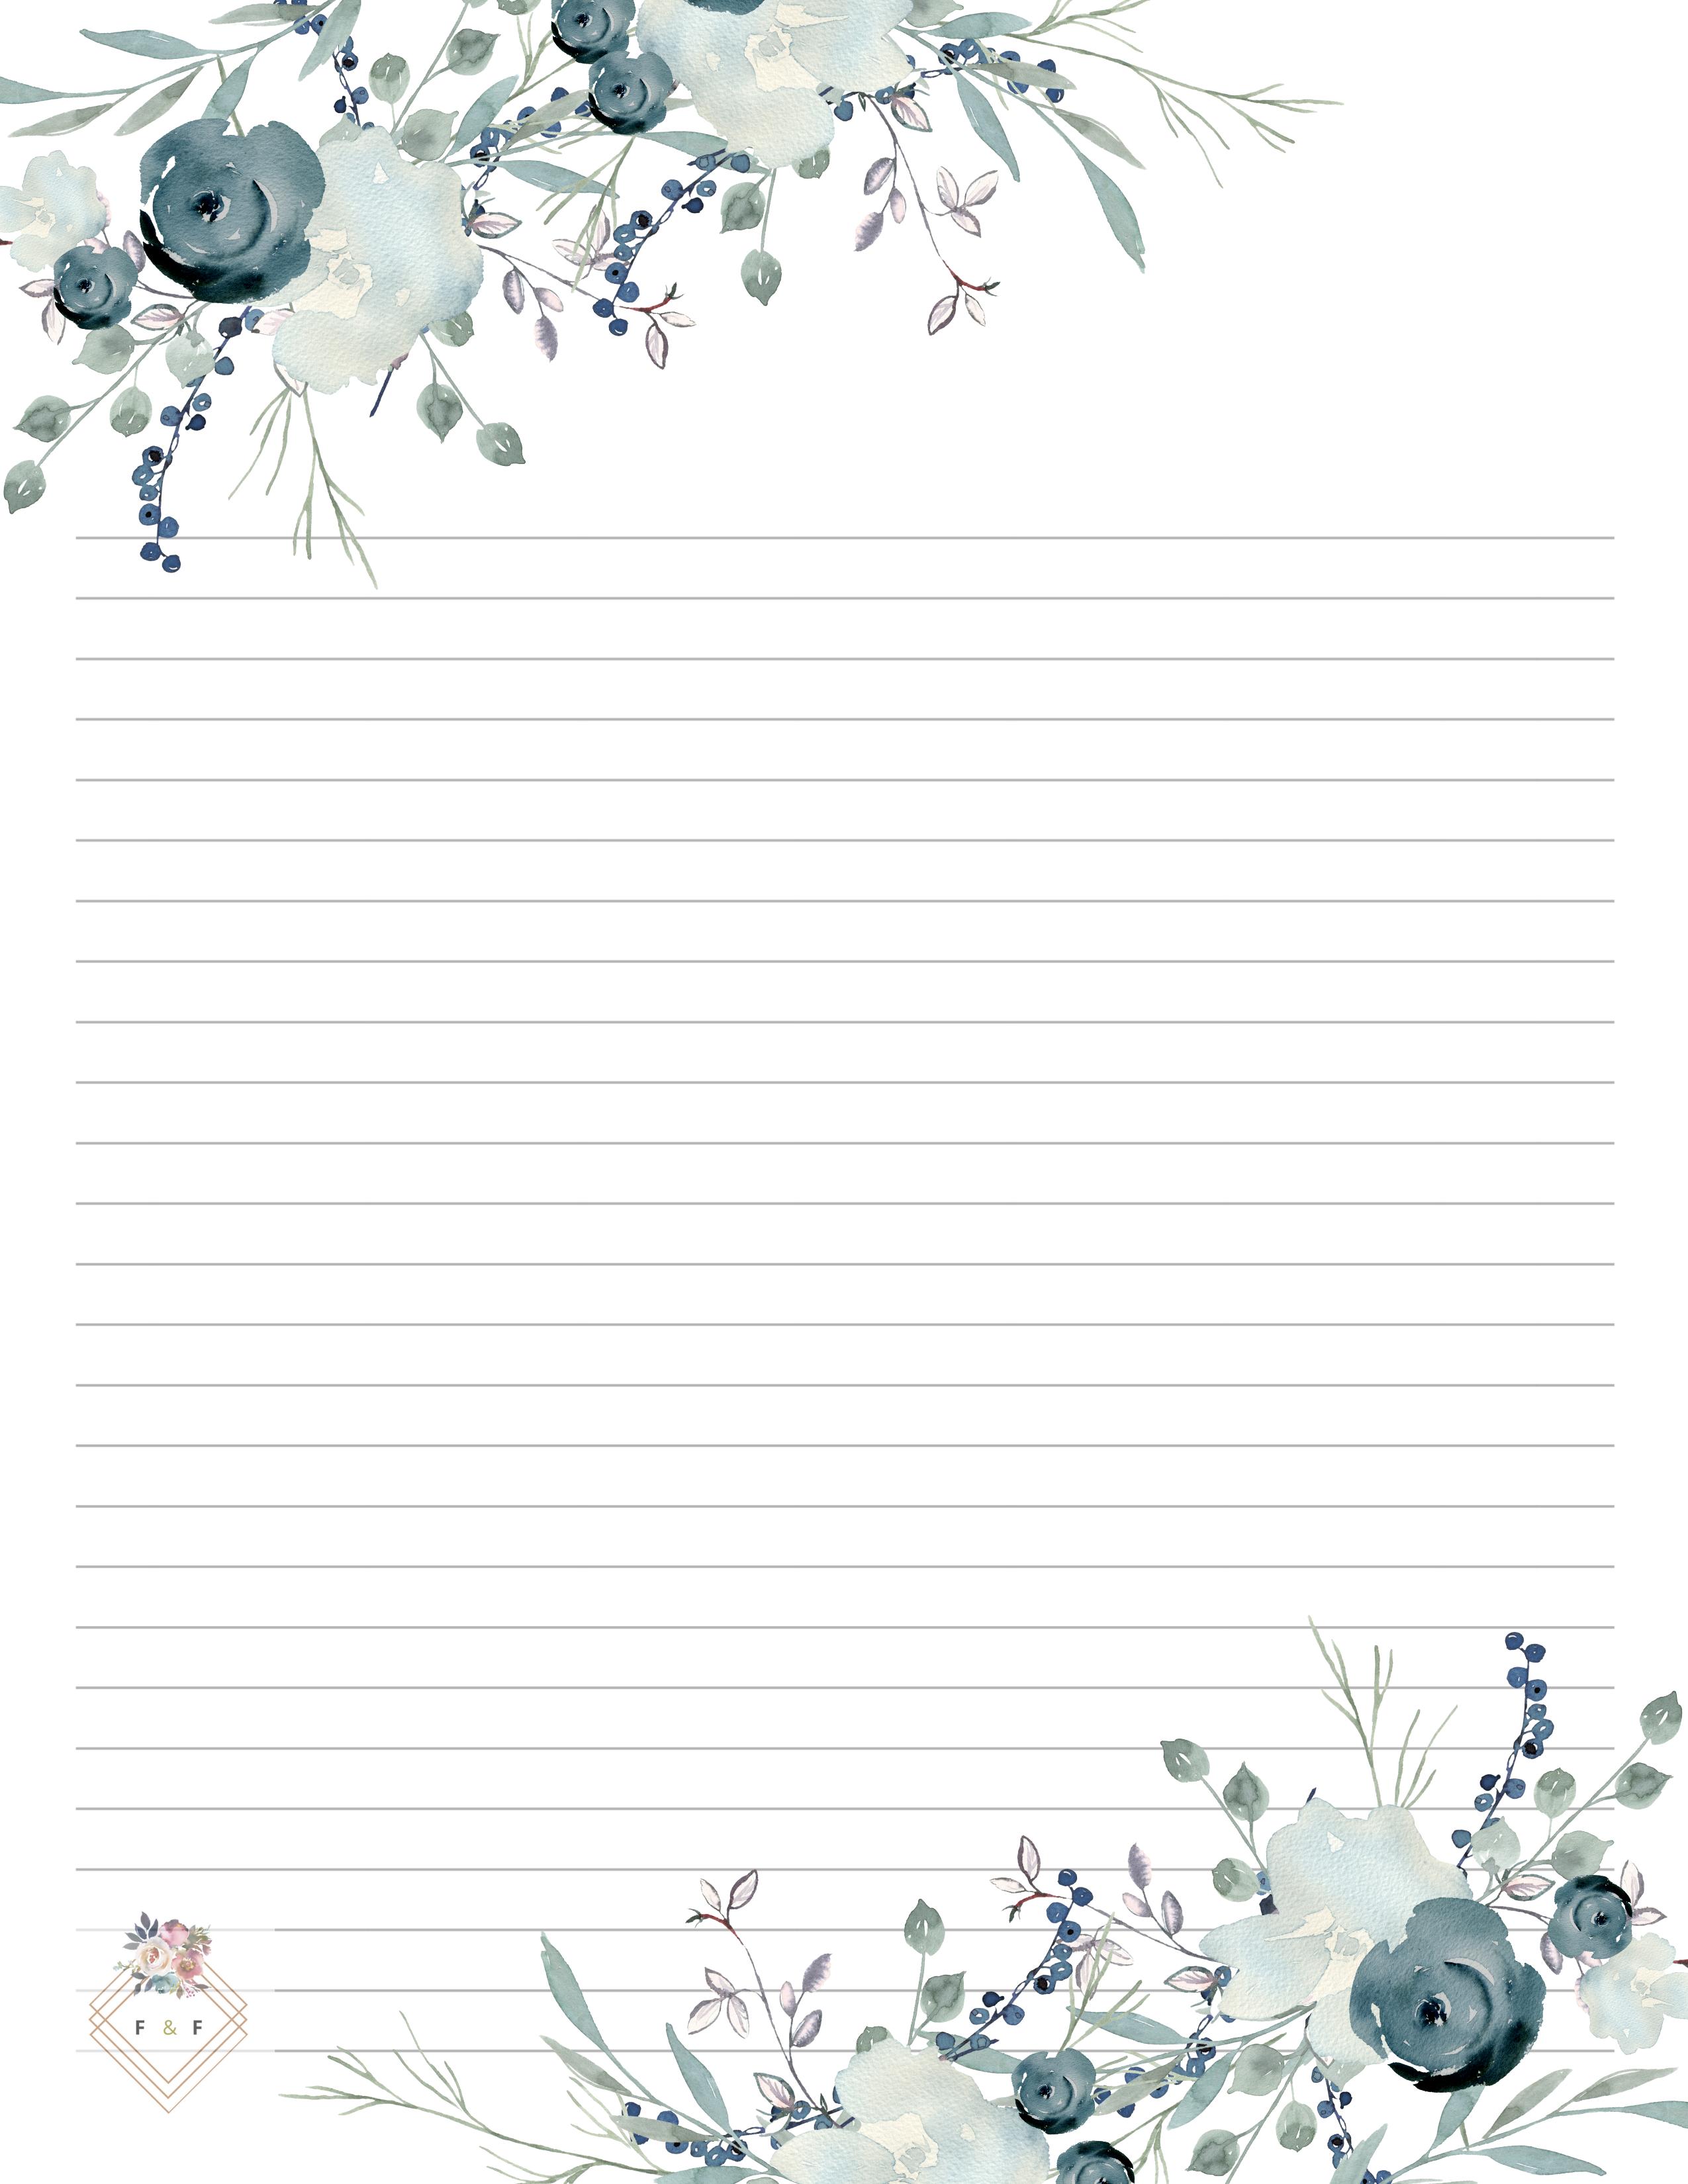 Blue Printable Letter Paper Set Floral Writing Paper 10 Page Etsy Writing Paper Printable Writing Paper Printable Stationery Free Printable Stationery